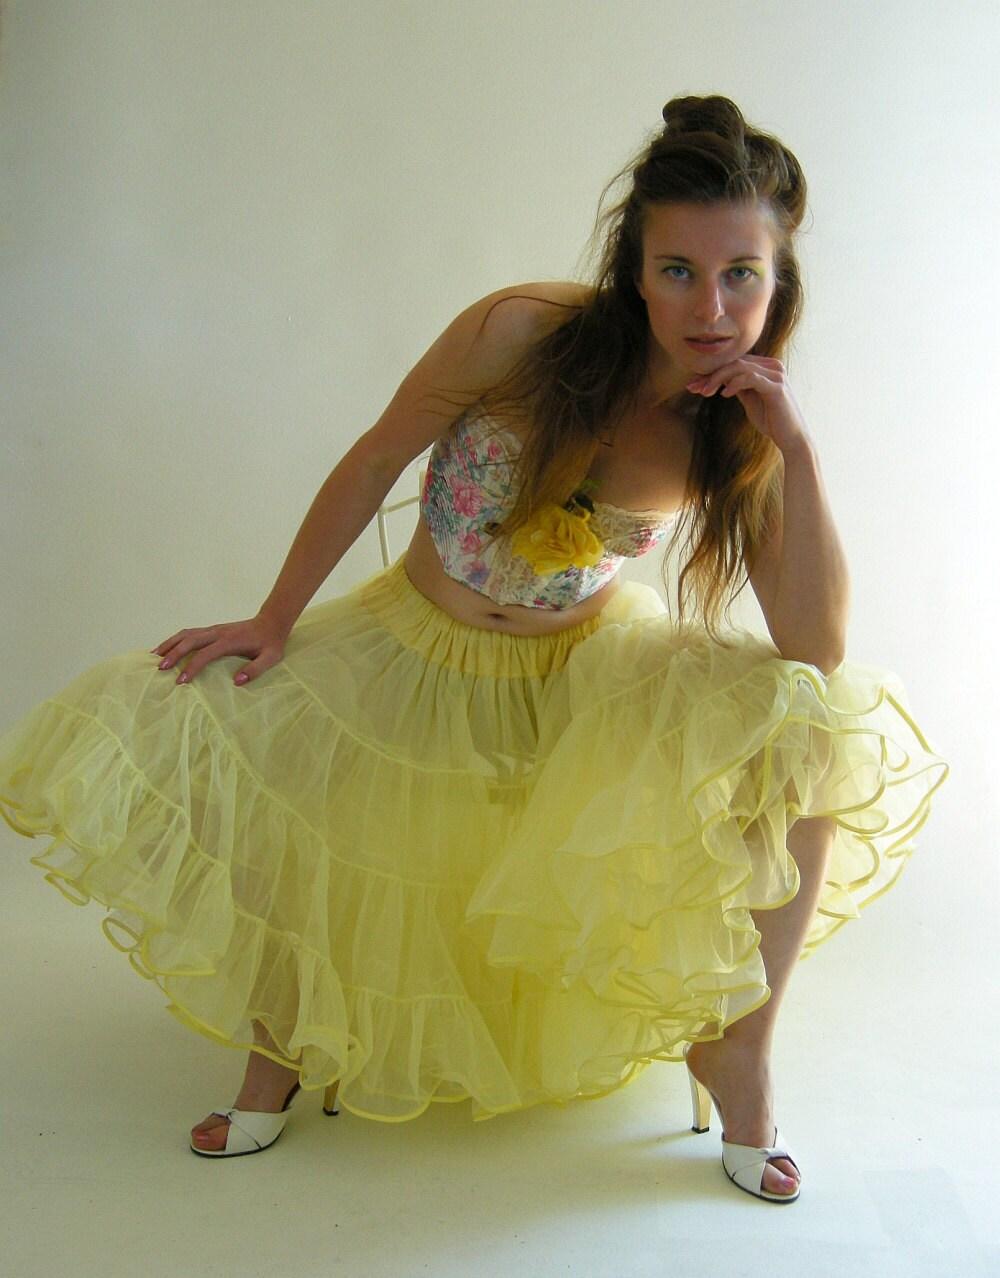 Crinoline Petticoat Yellow Vintage 50s 60s Chiffon by empressjade from etsy.com